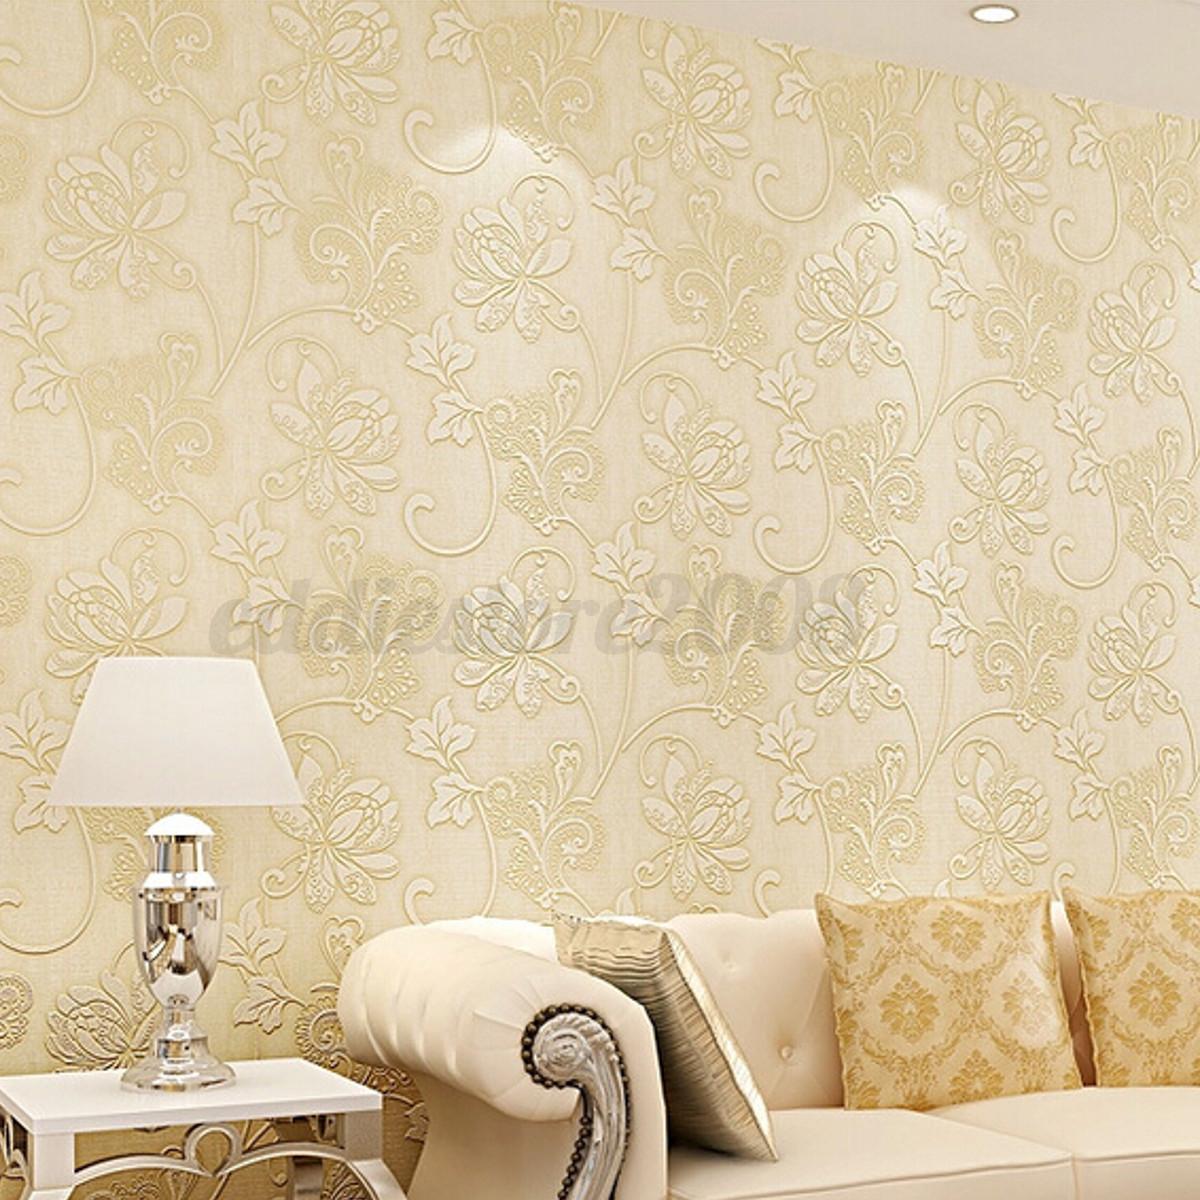 Floral flower 3d embossed textured flocked non woven for 3d embossed wallpaper